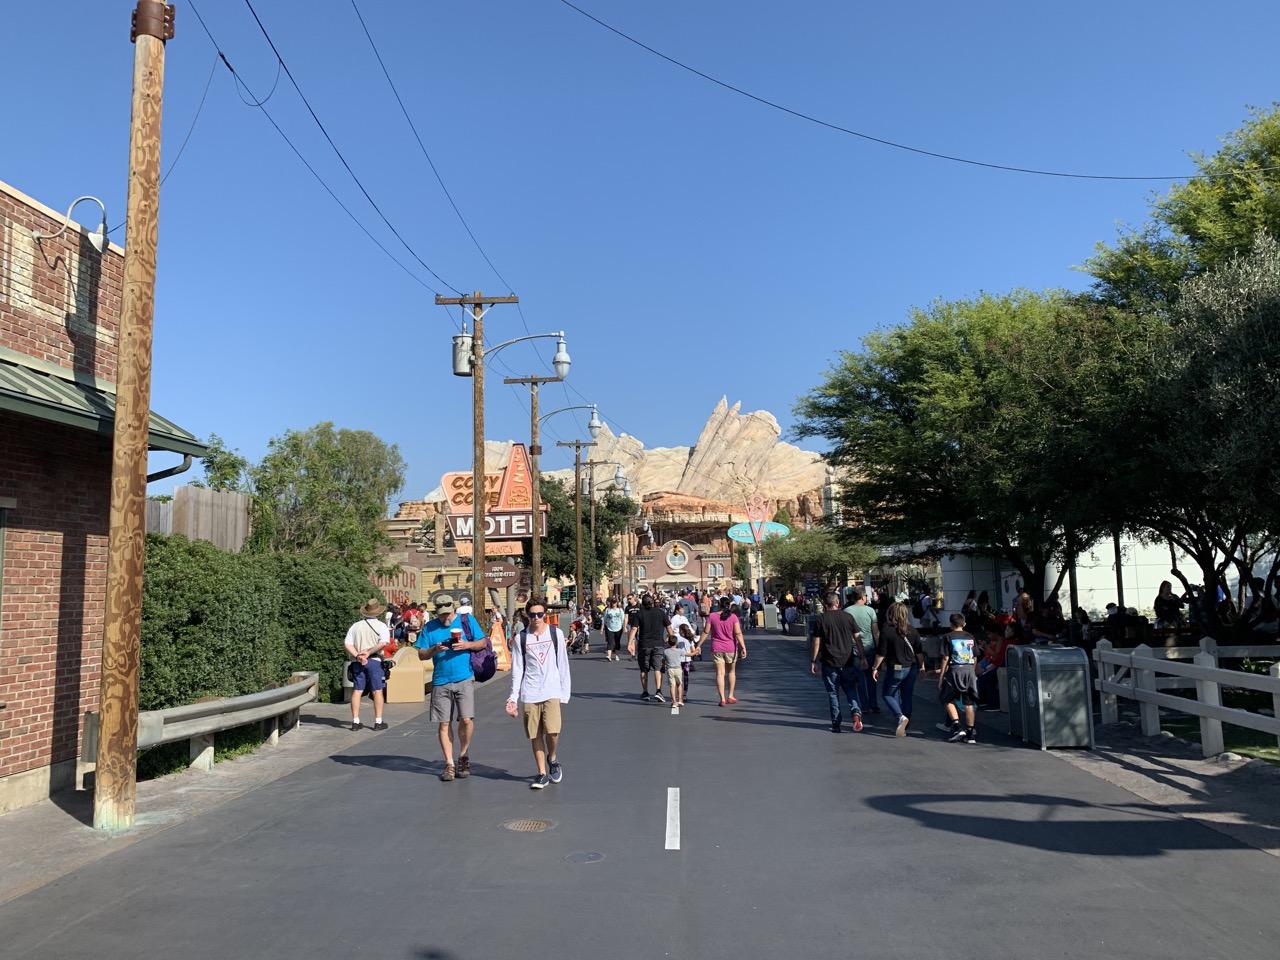 disneyland trip report june 2019 part 2 16 crowds.jpeg